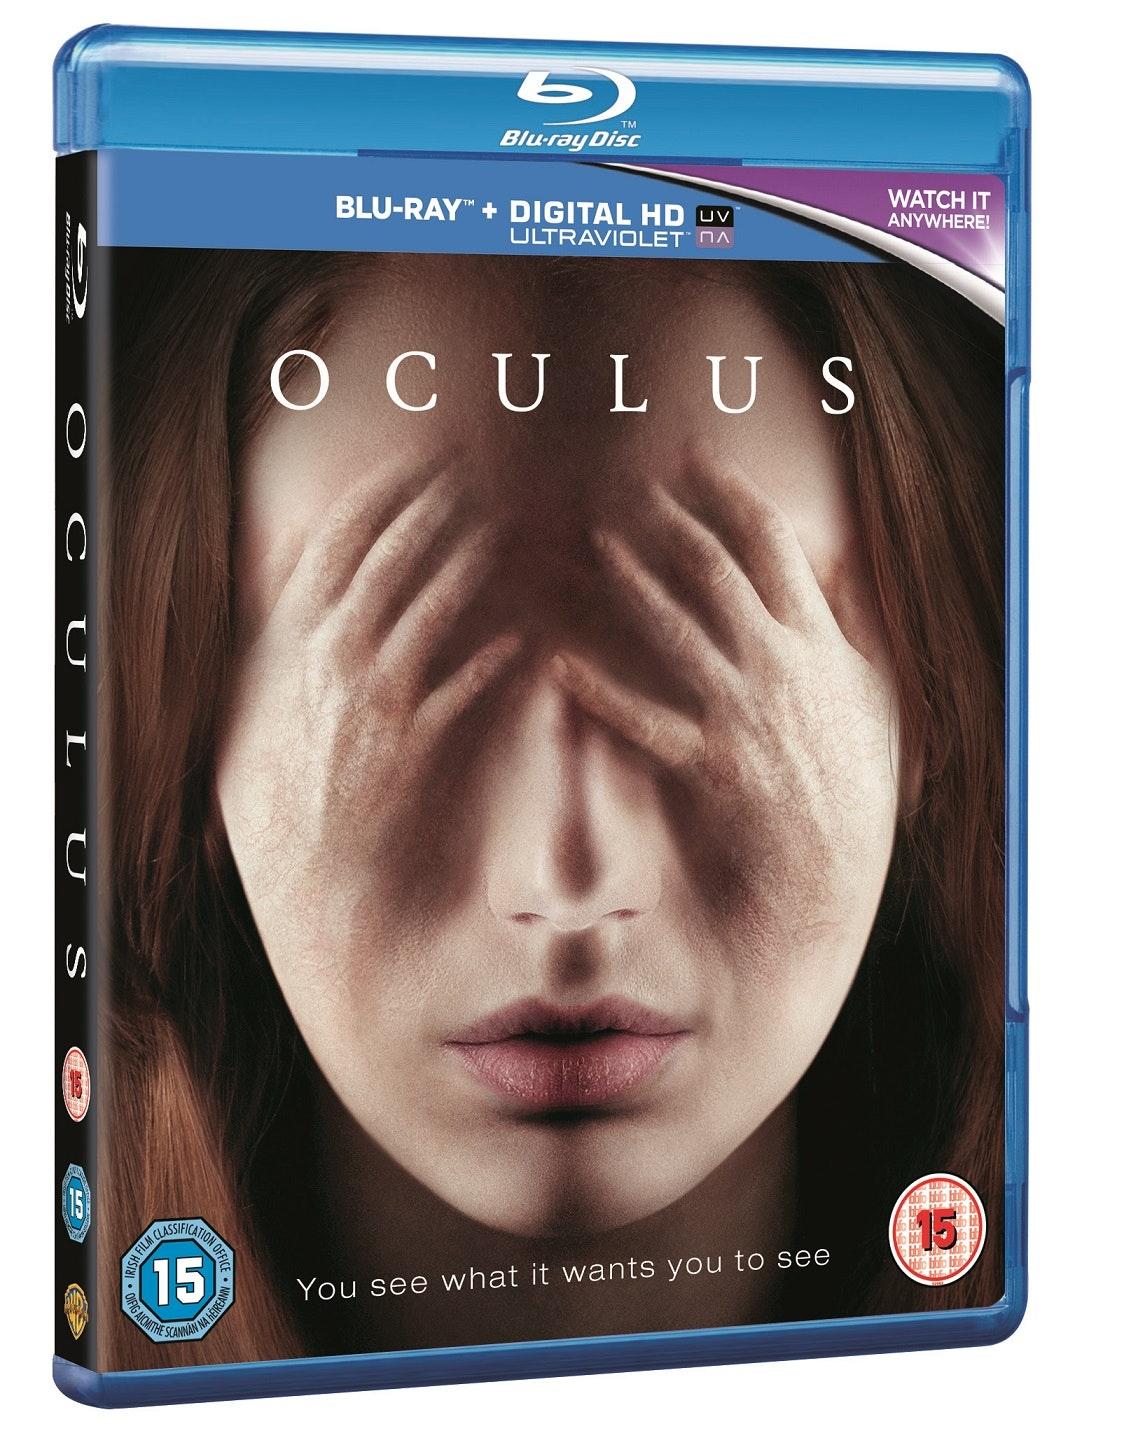 Oculus sweepstakes